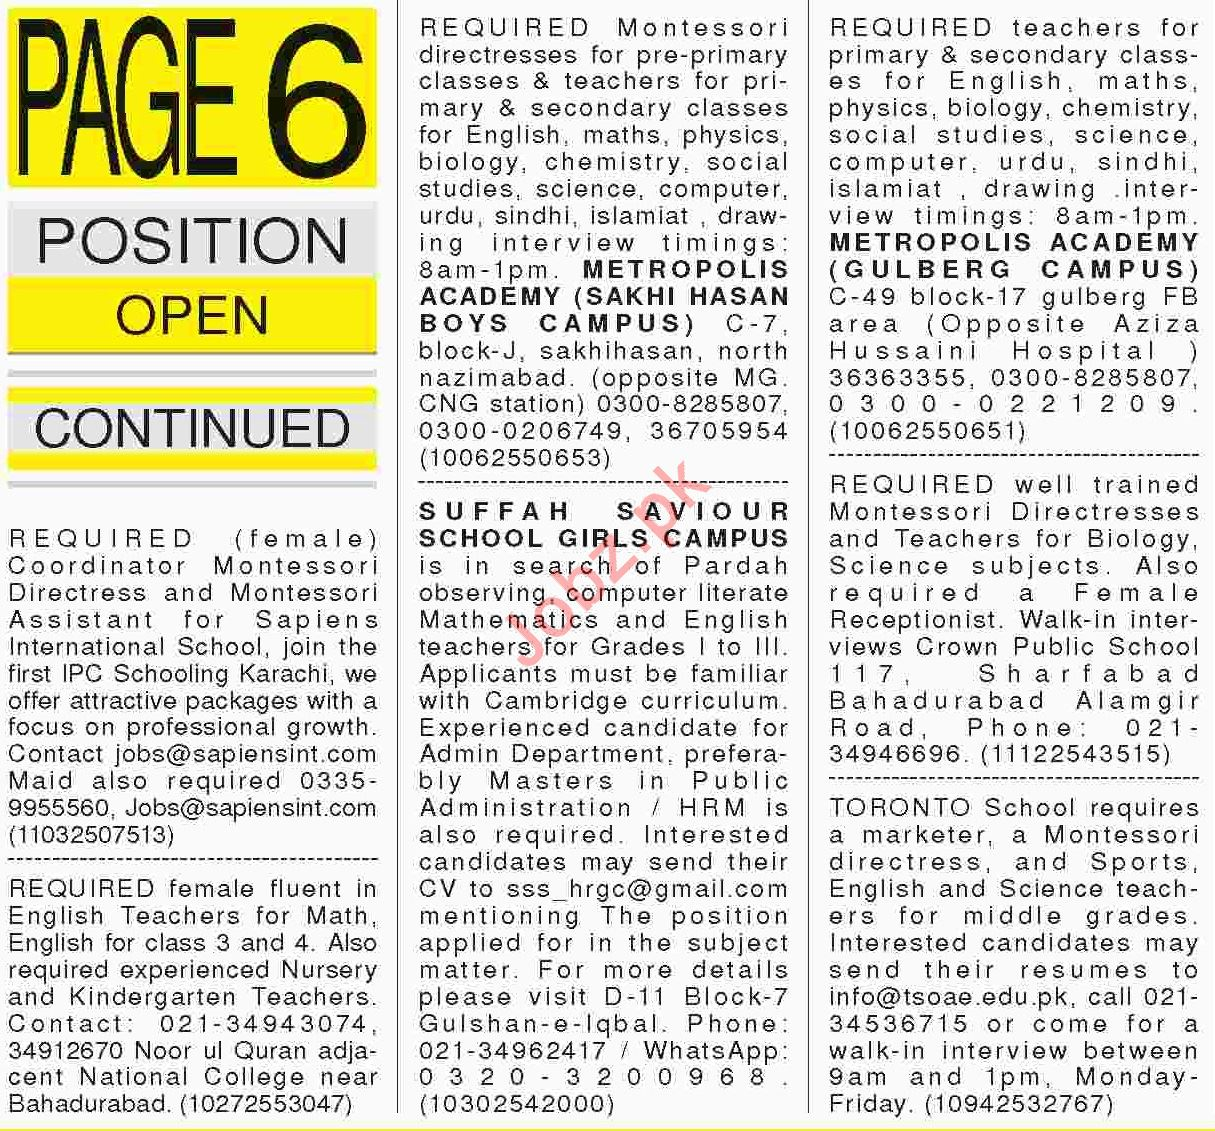 Daily Dawn Sunday Newspaper Teachers Jobs in Karachi 2019